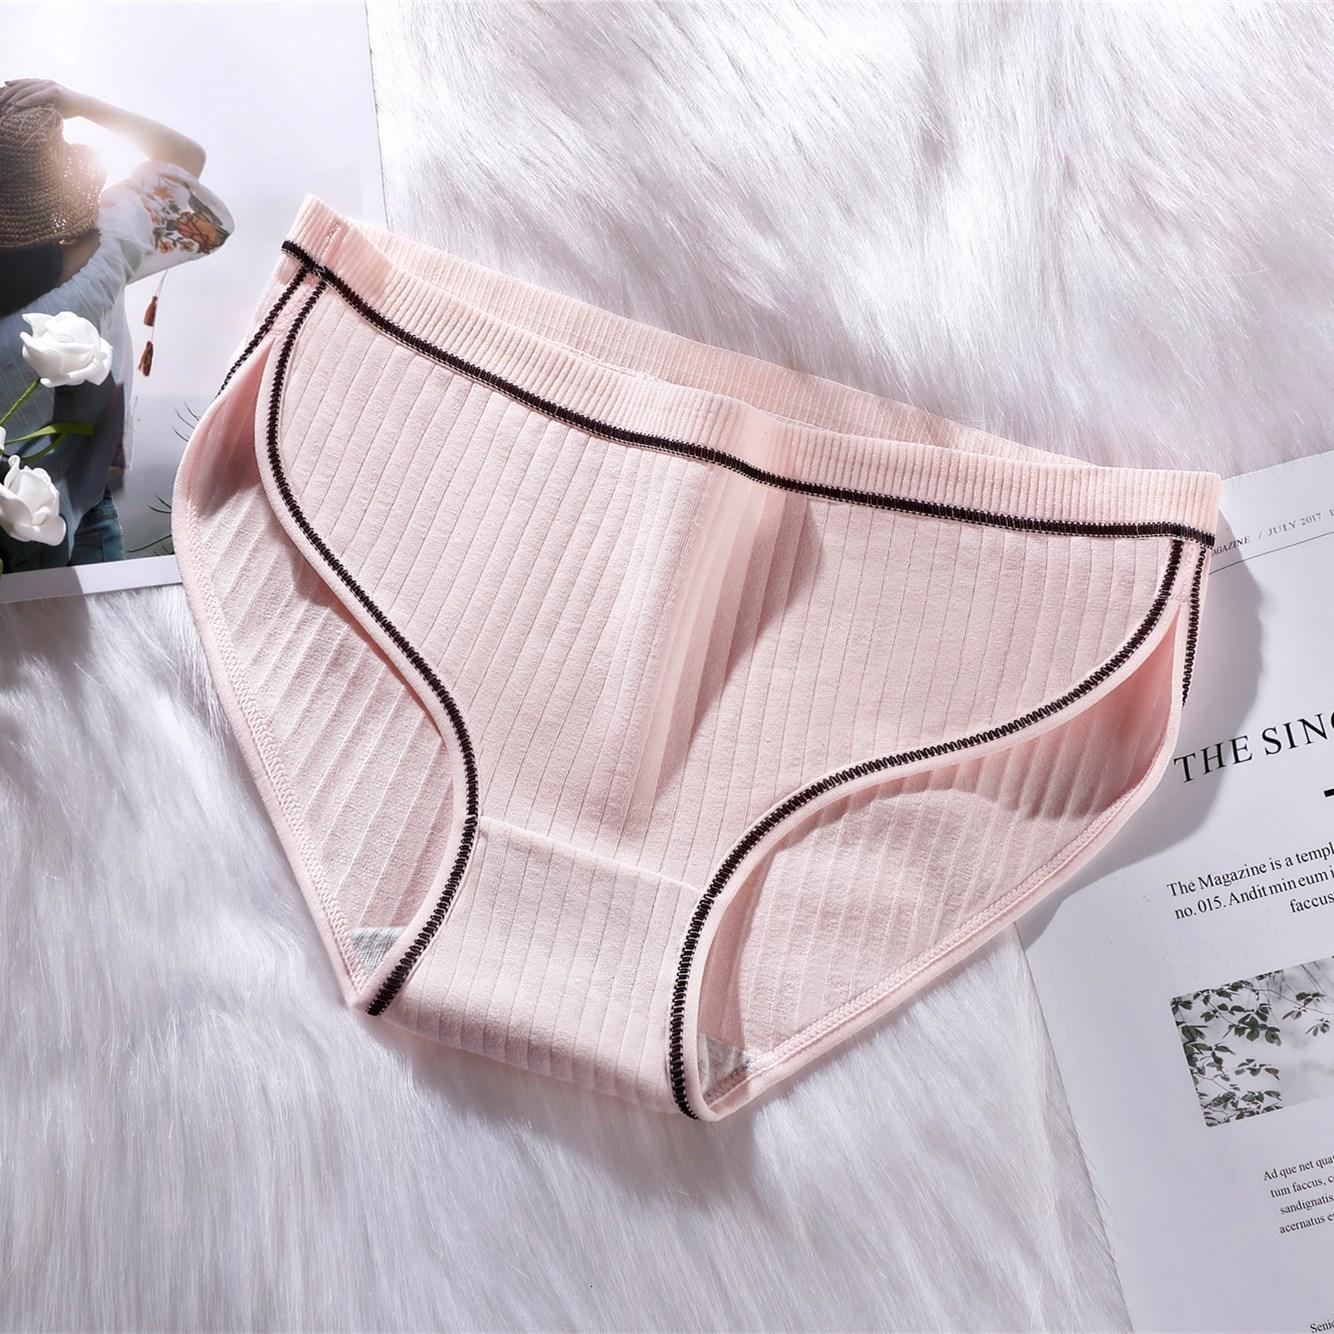 NEW Women's Cotton Panties Female Lace Edge Breathable Briefs Sexy Underwear Women Cotton Crotch Lingerie Intimates Soft Briefs